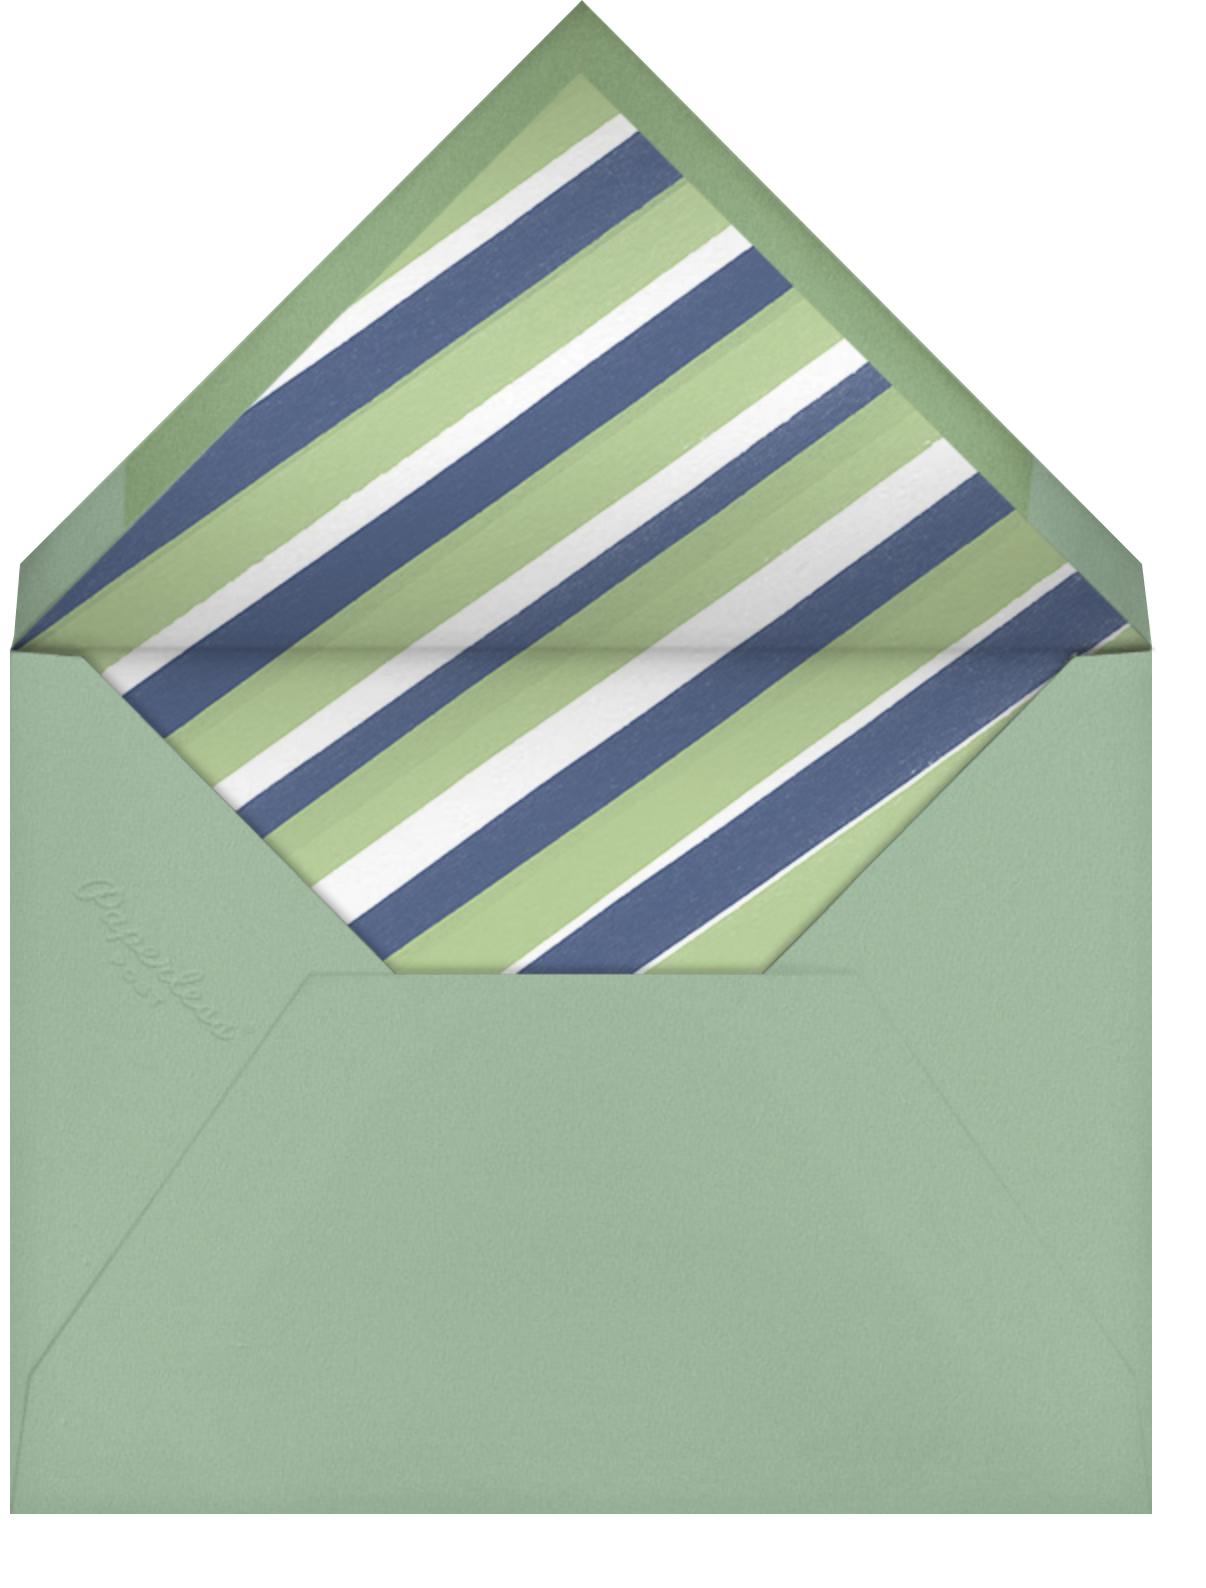 Thoroughbred Birthday - Sage/Deep - Paperless Post - Envelope